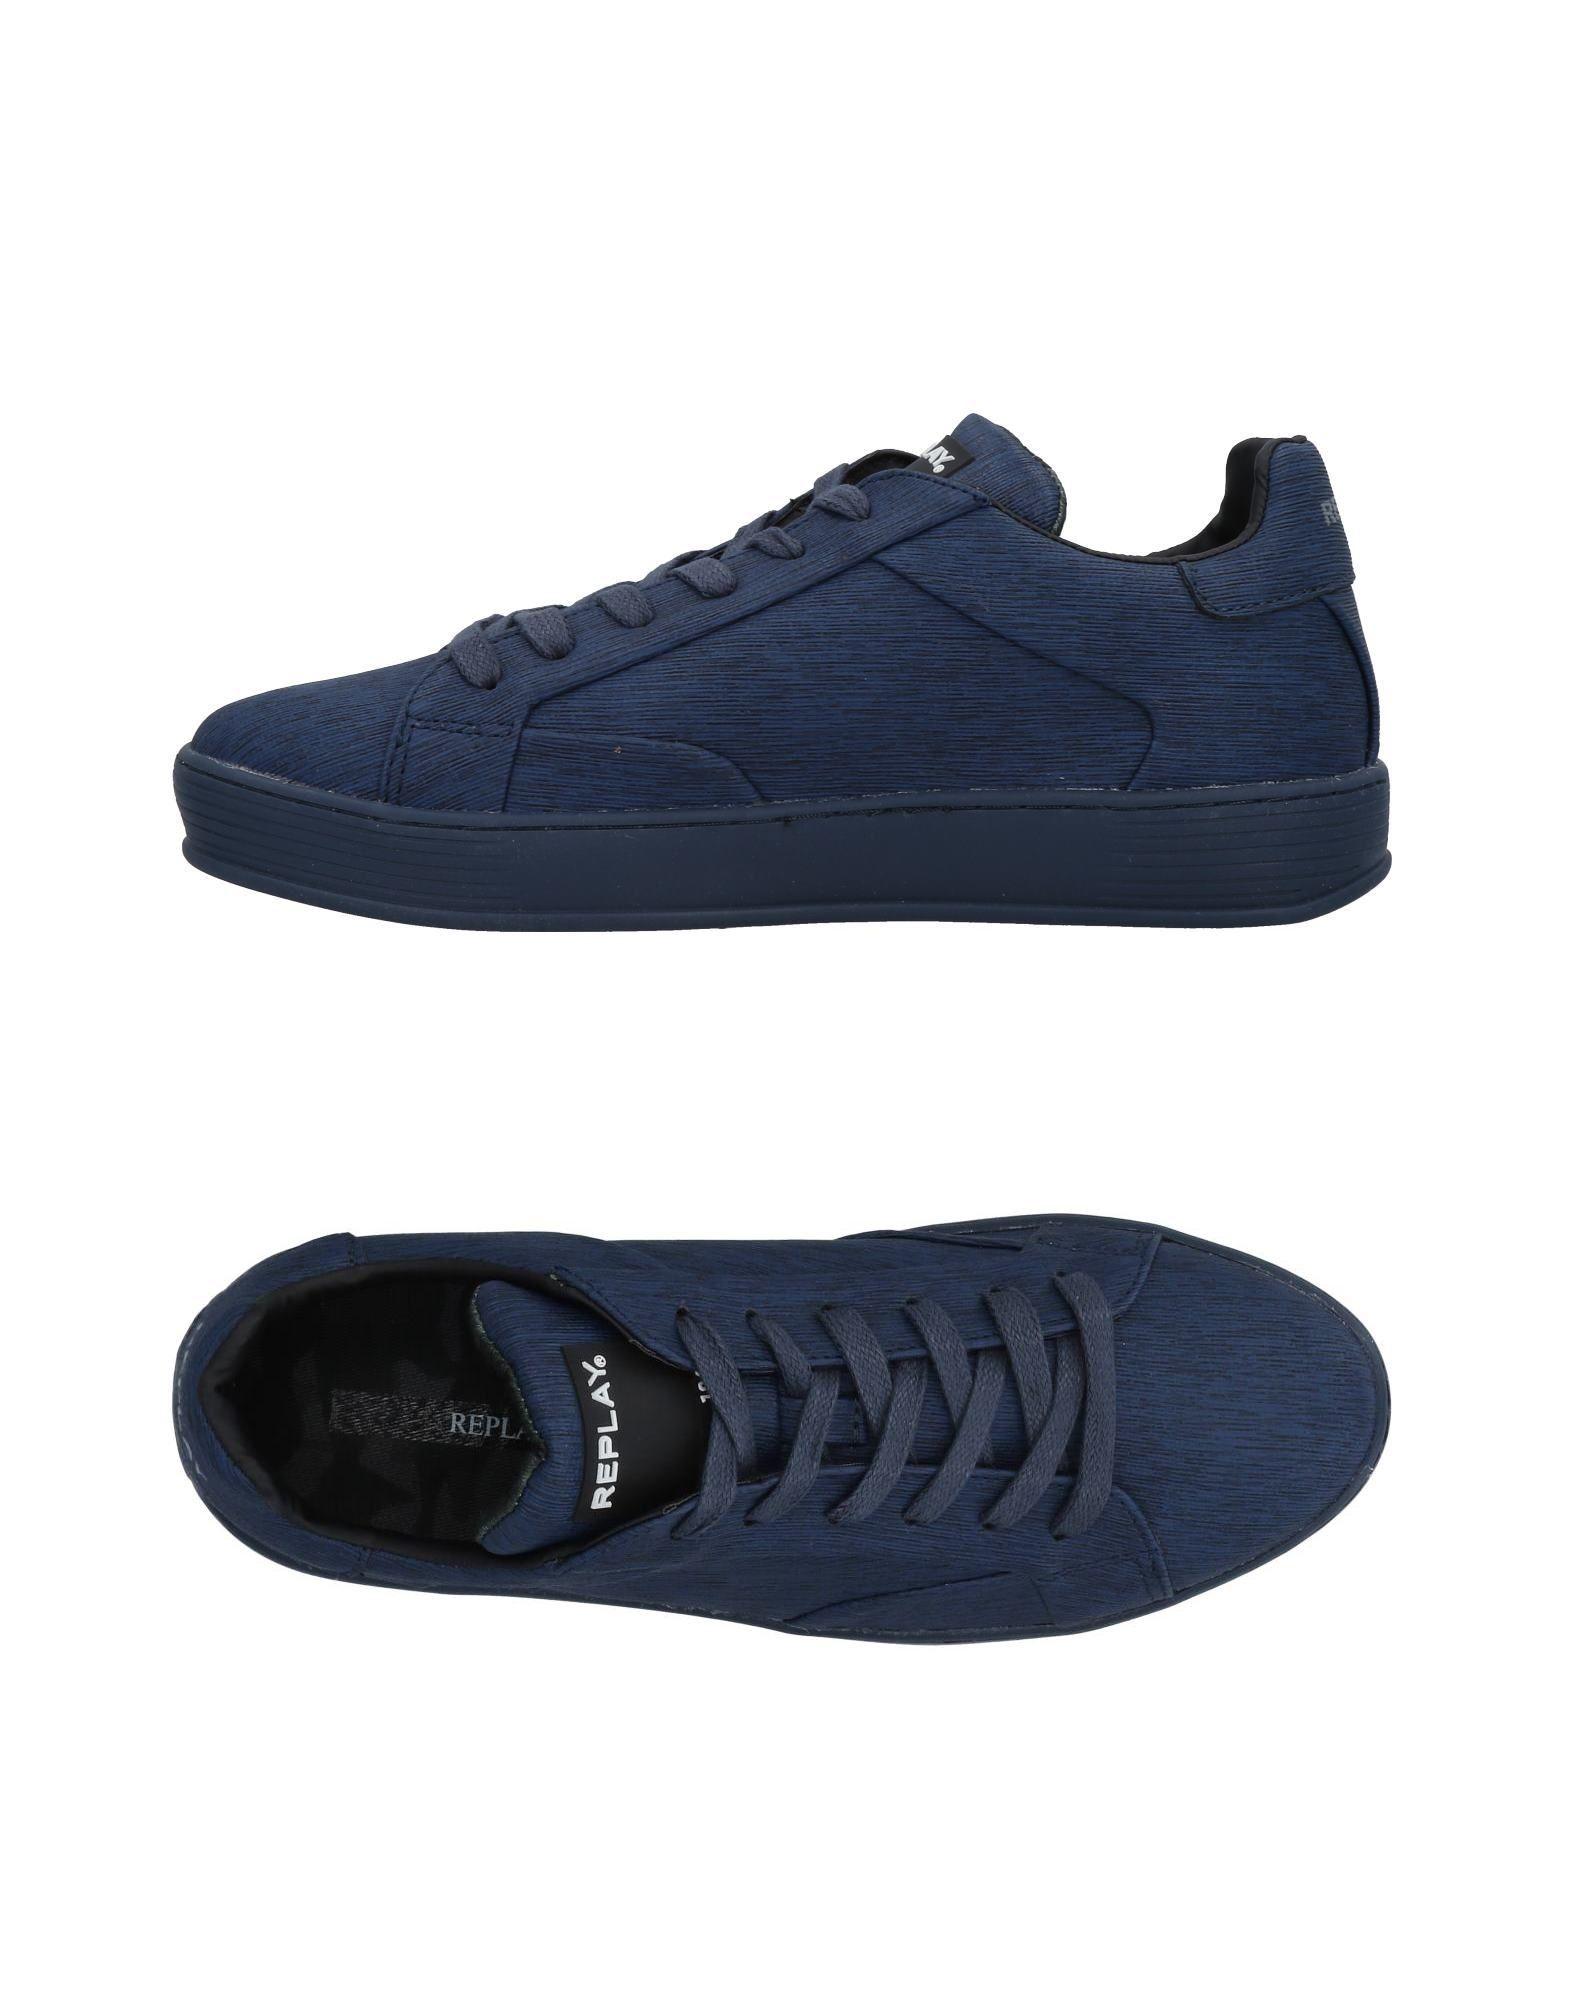 Moda Sneakers Replay Uomo - 11494001QA